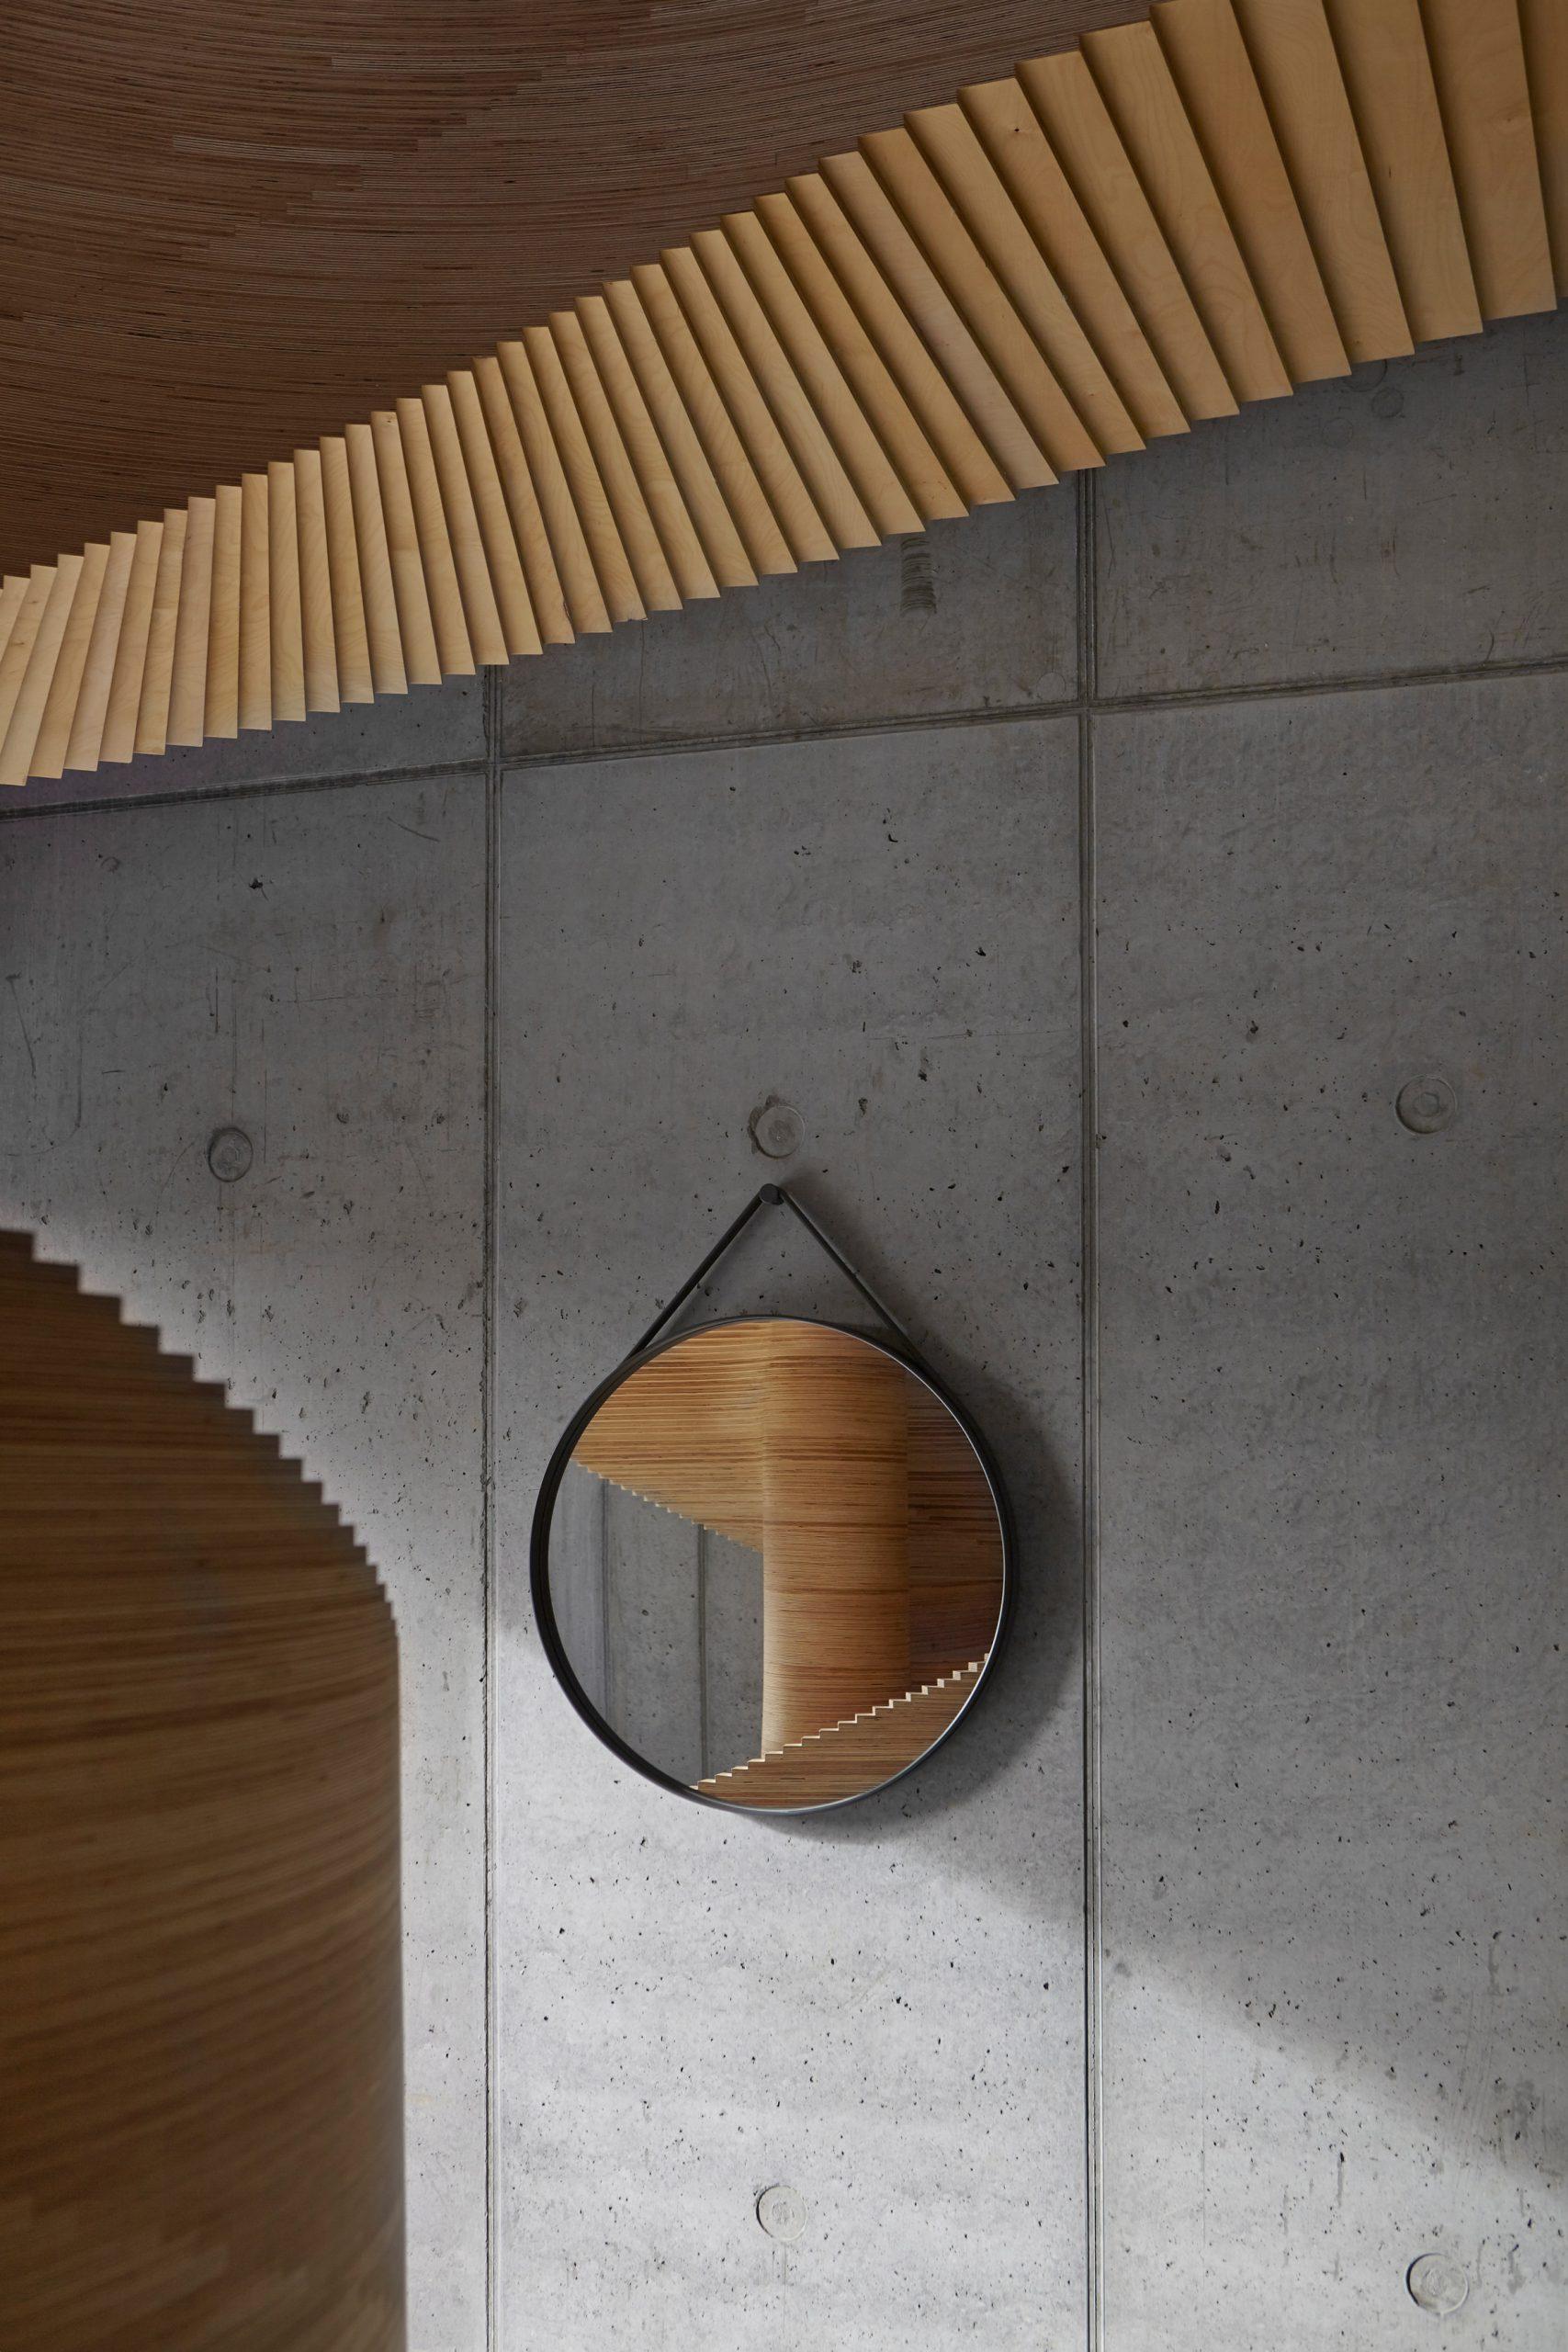 tommy-rand-house-denmark_dezeen_2364_col_6-scaled.jpg